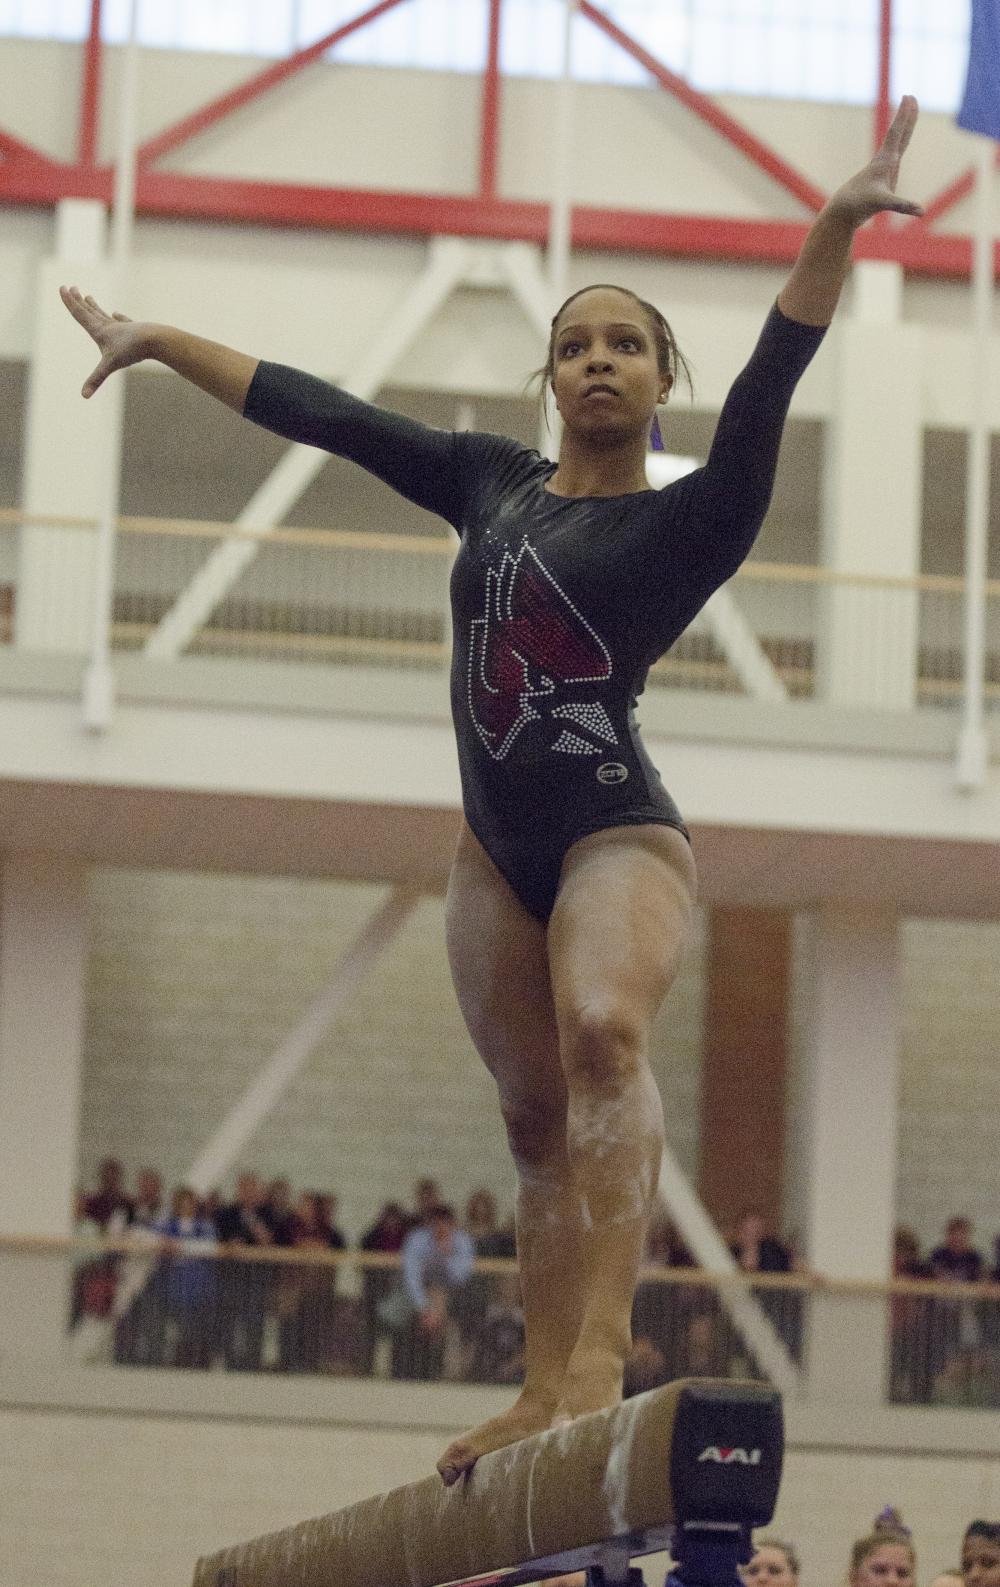 nc state sweetheart gymnastics meet 2015